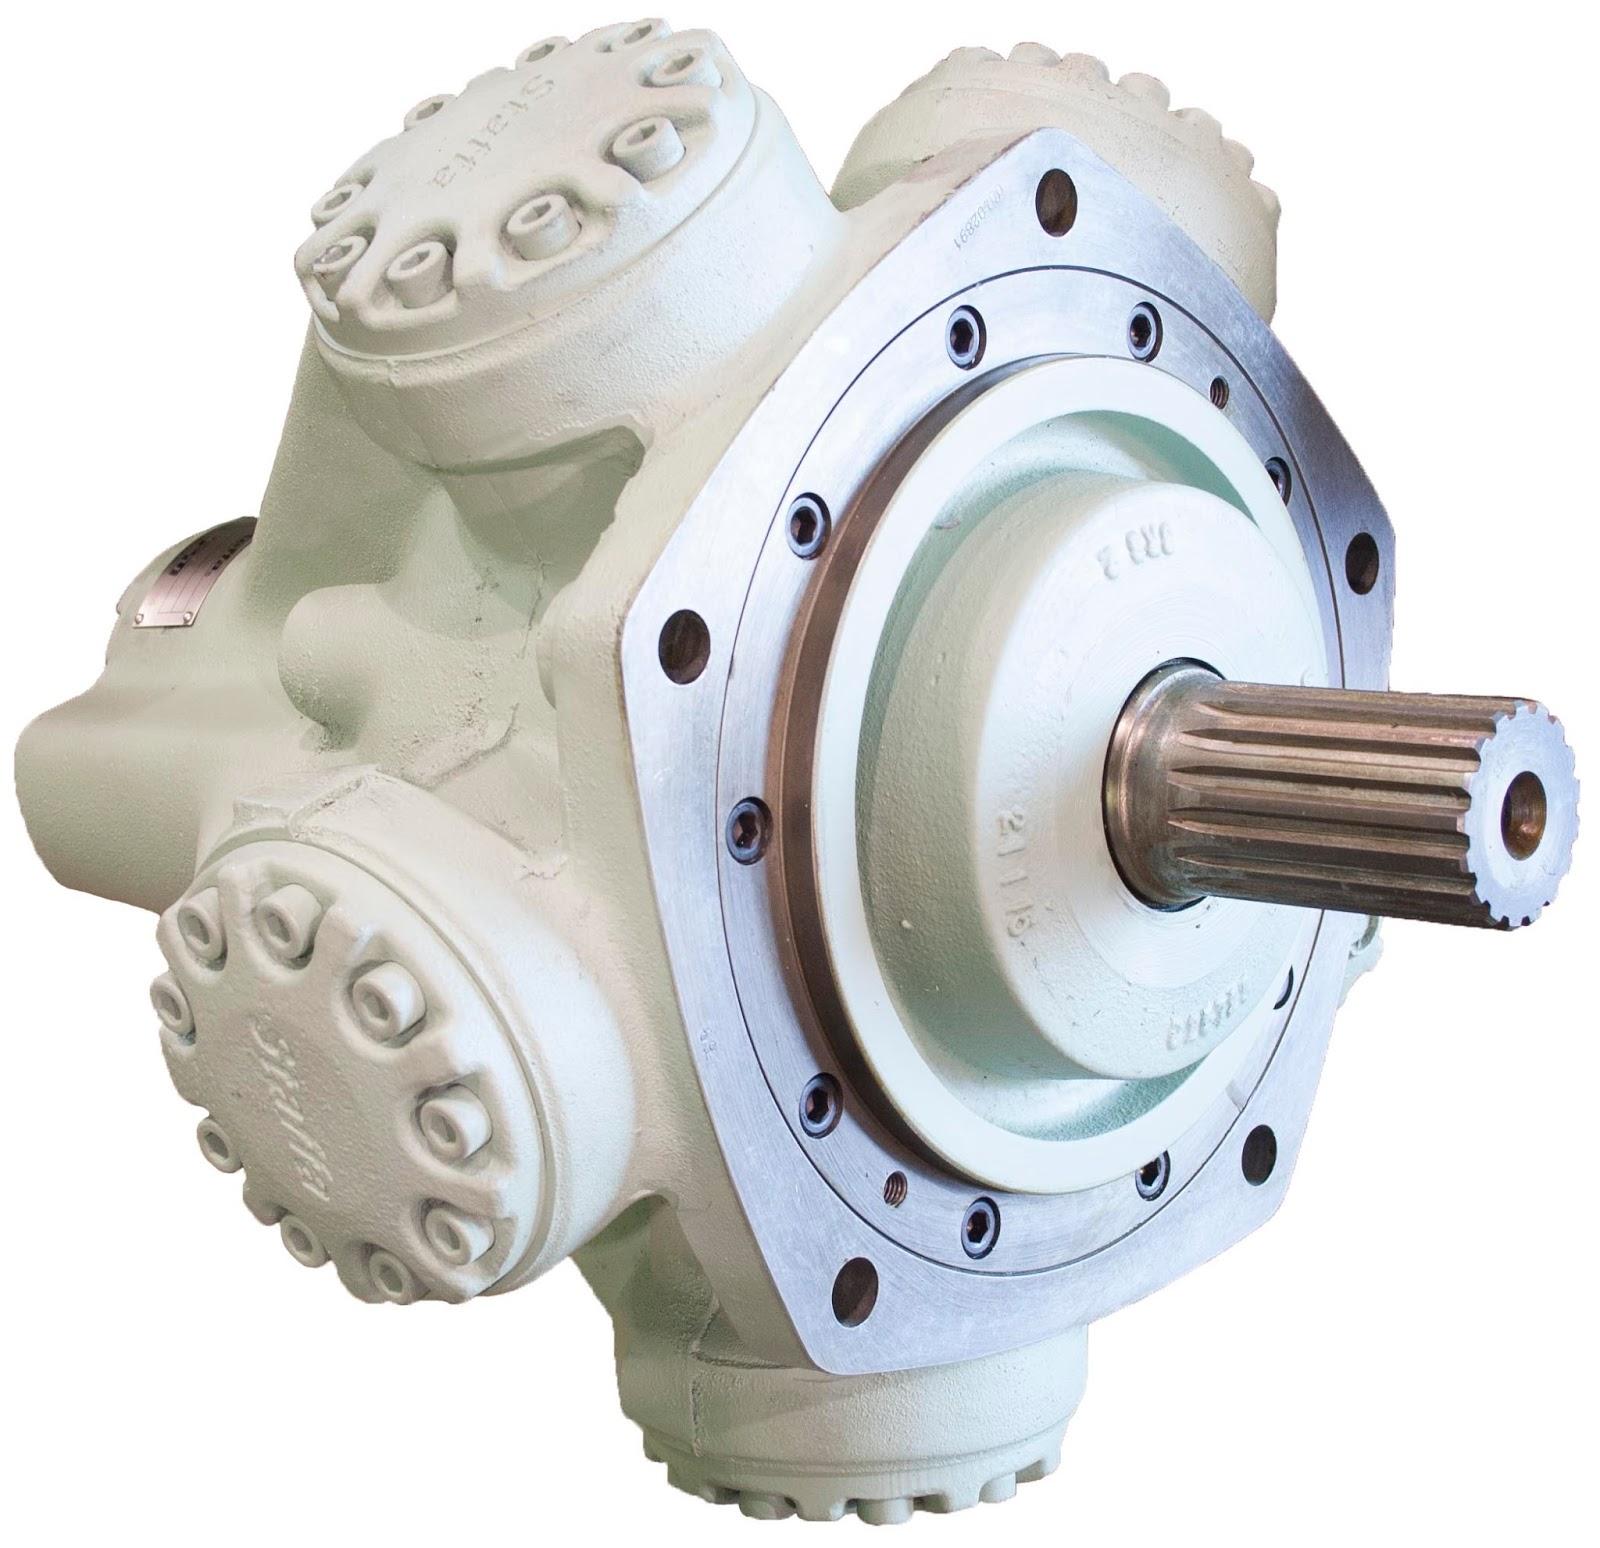 Radial Piston Hydraulic Motor : Flint hydraulics inc october